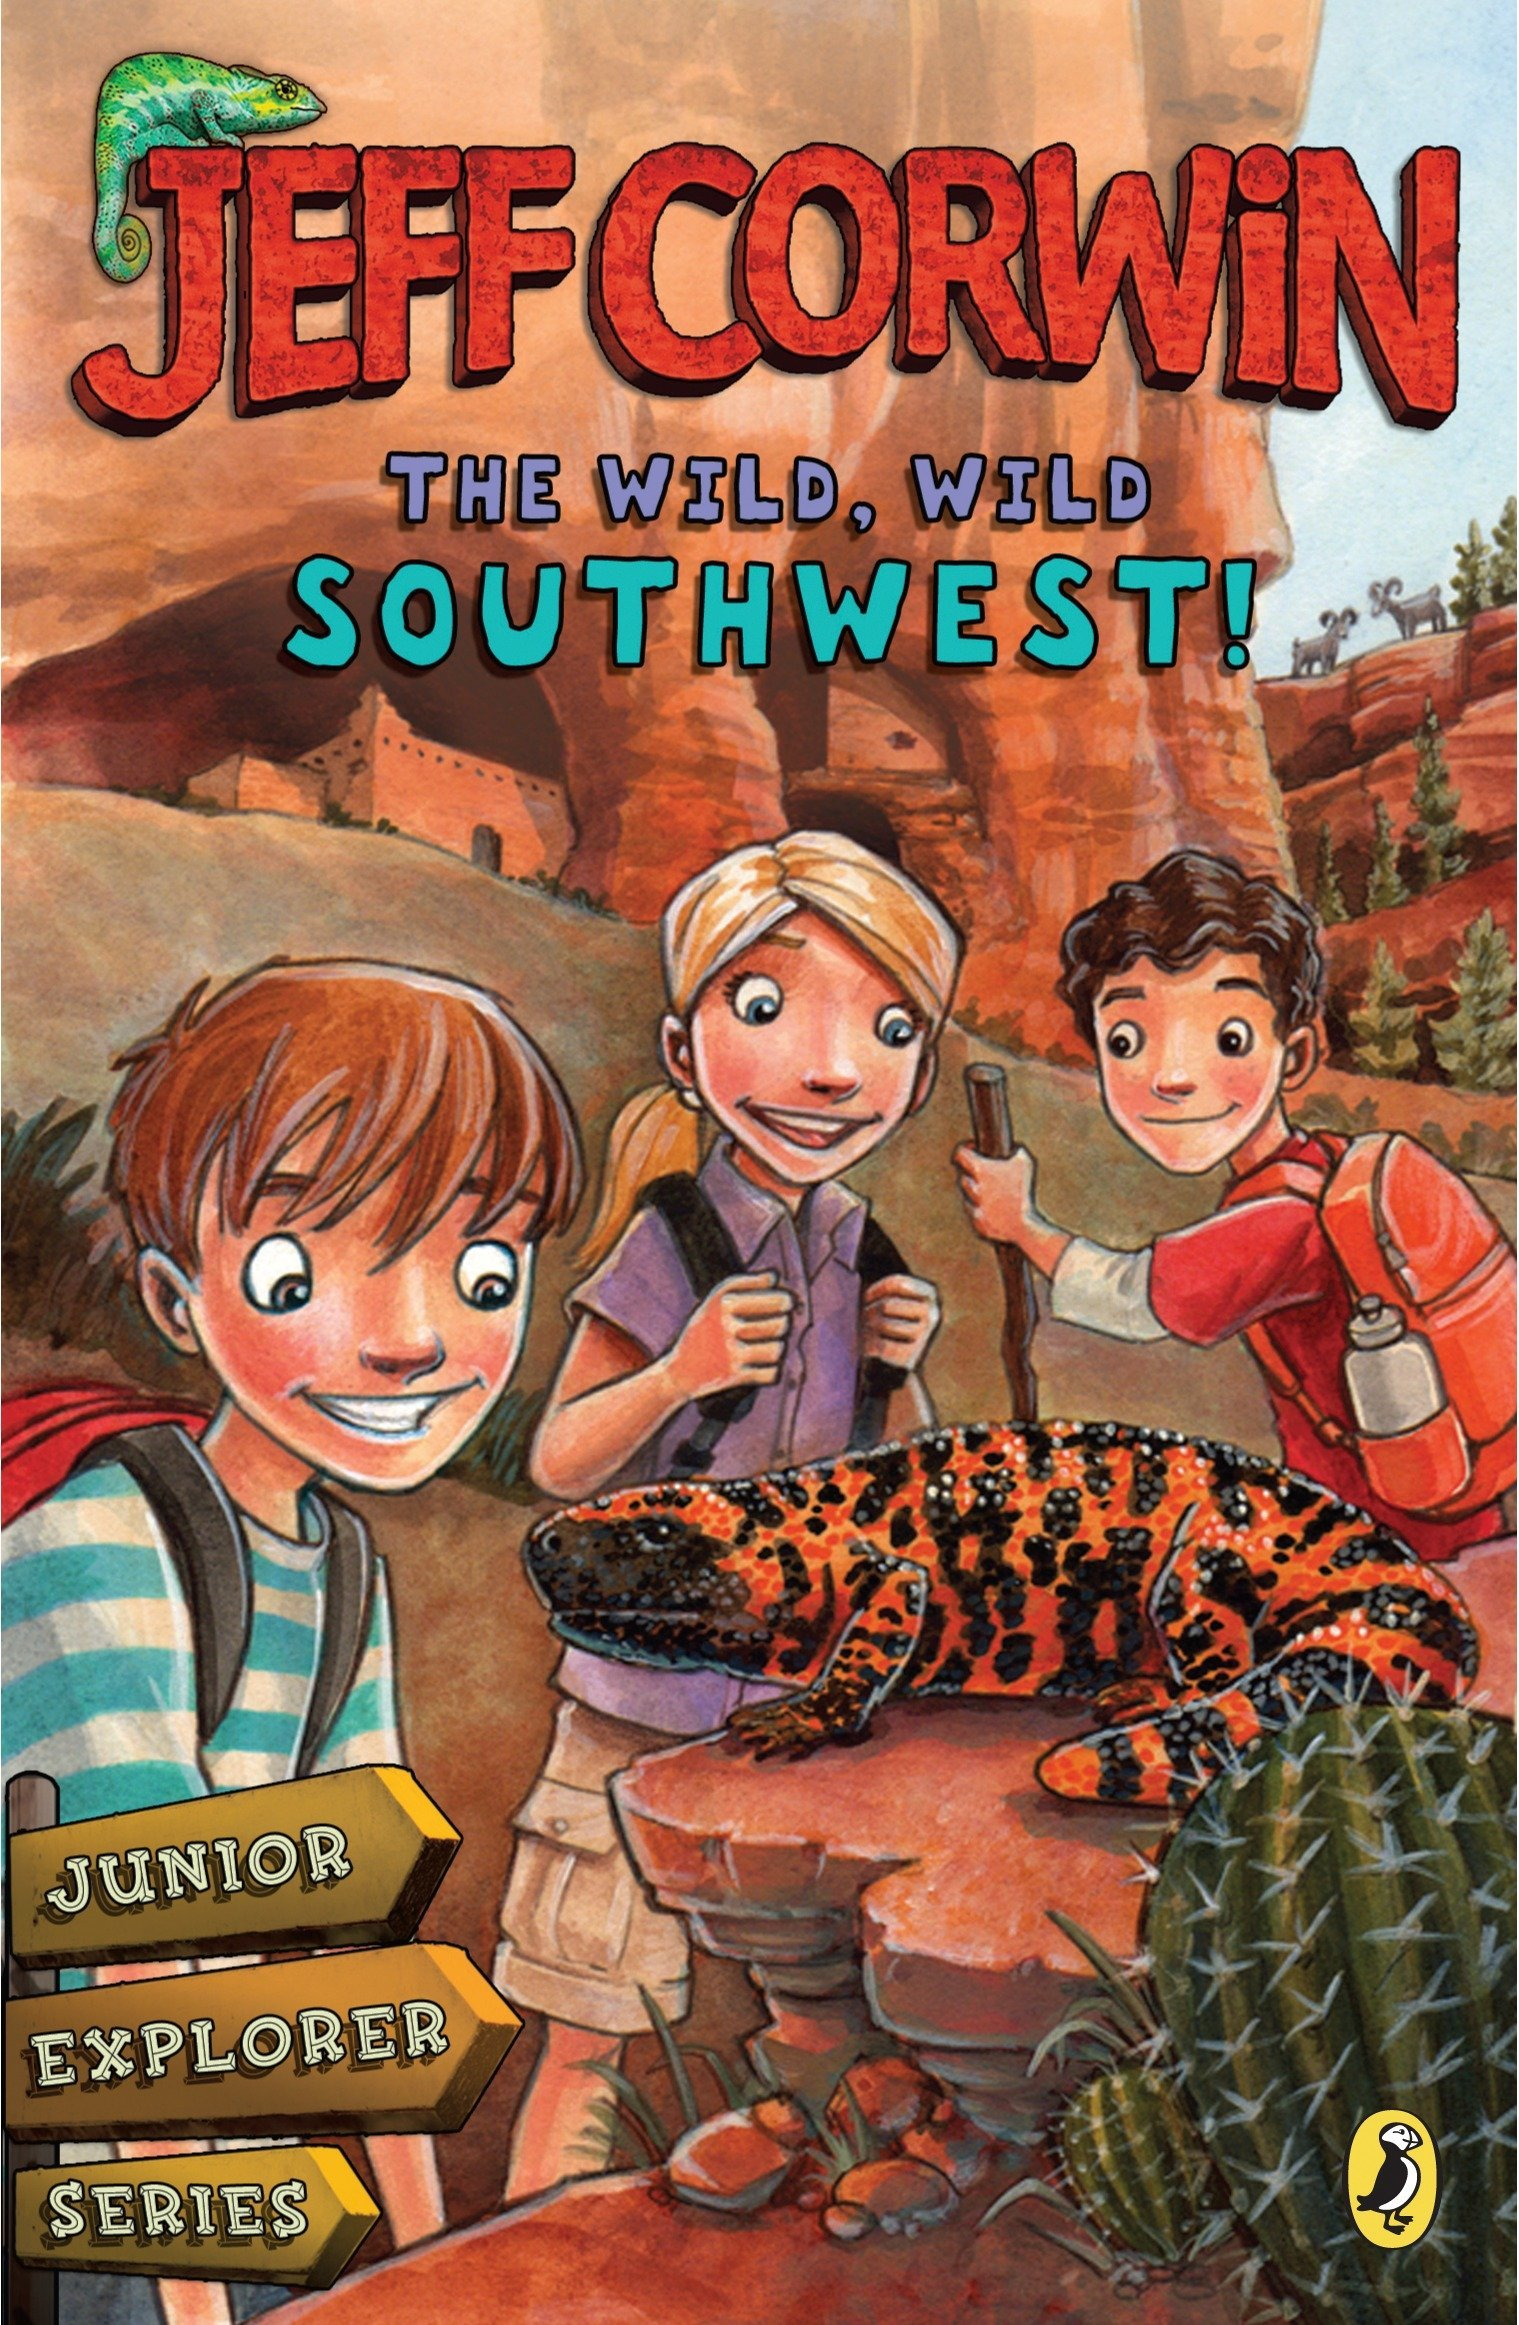 The Wild, Wild Southwest!: Junior Explorer Series Book 3 PDF